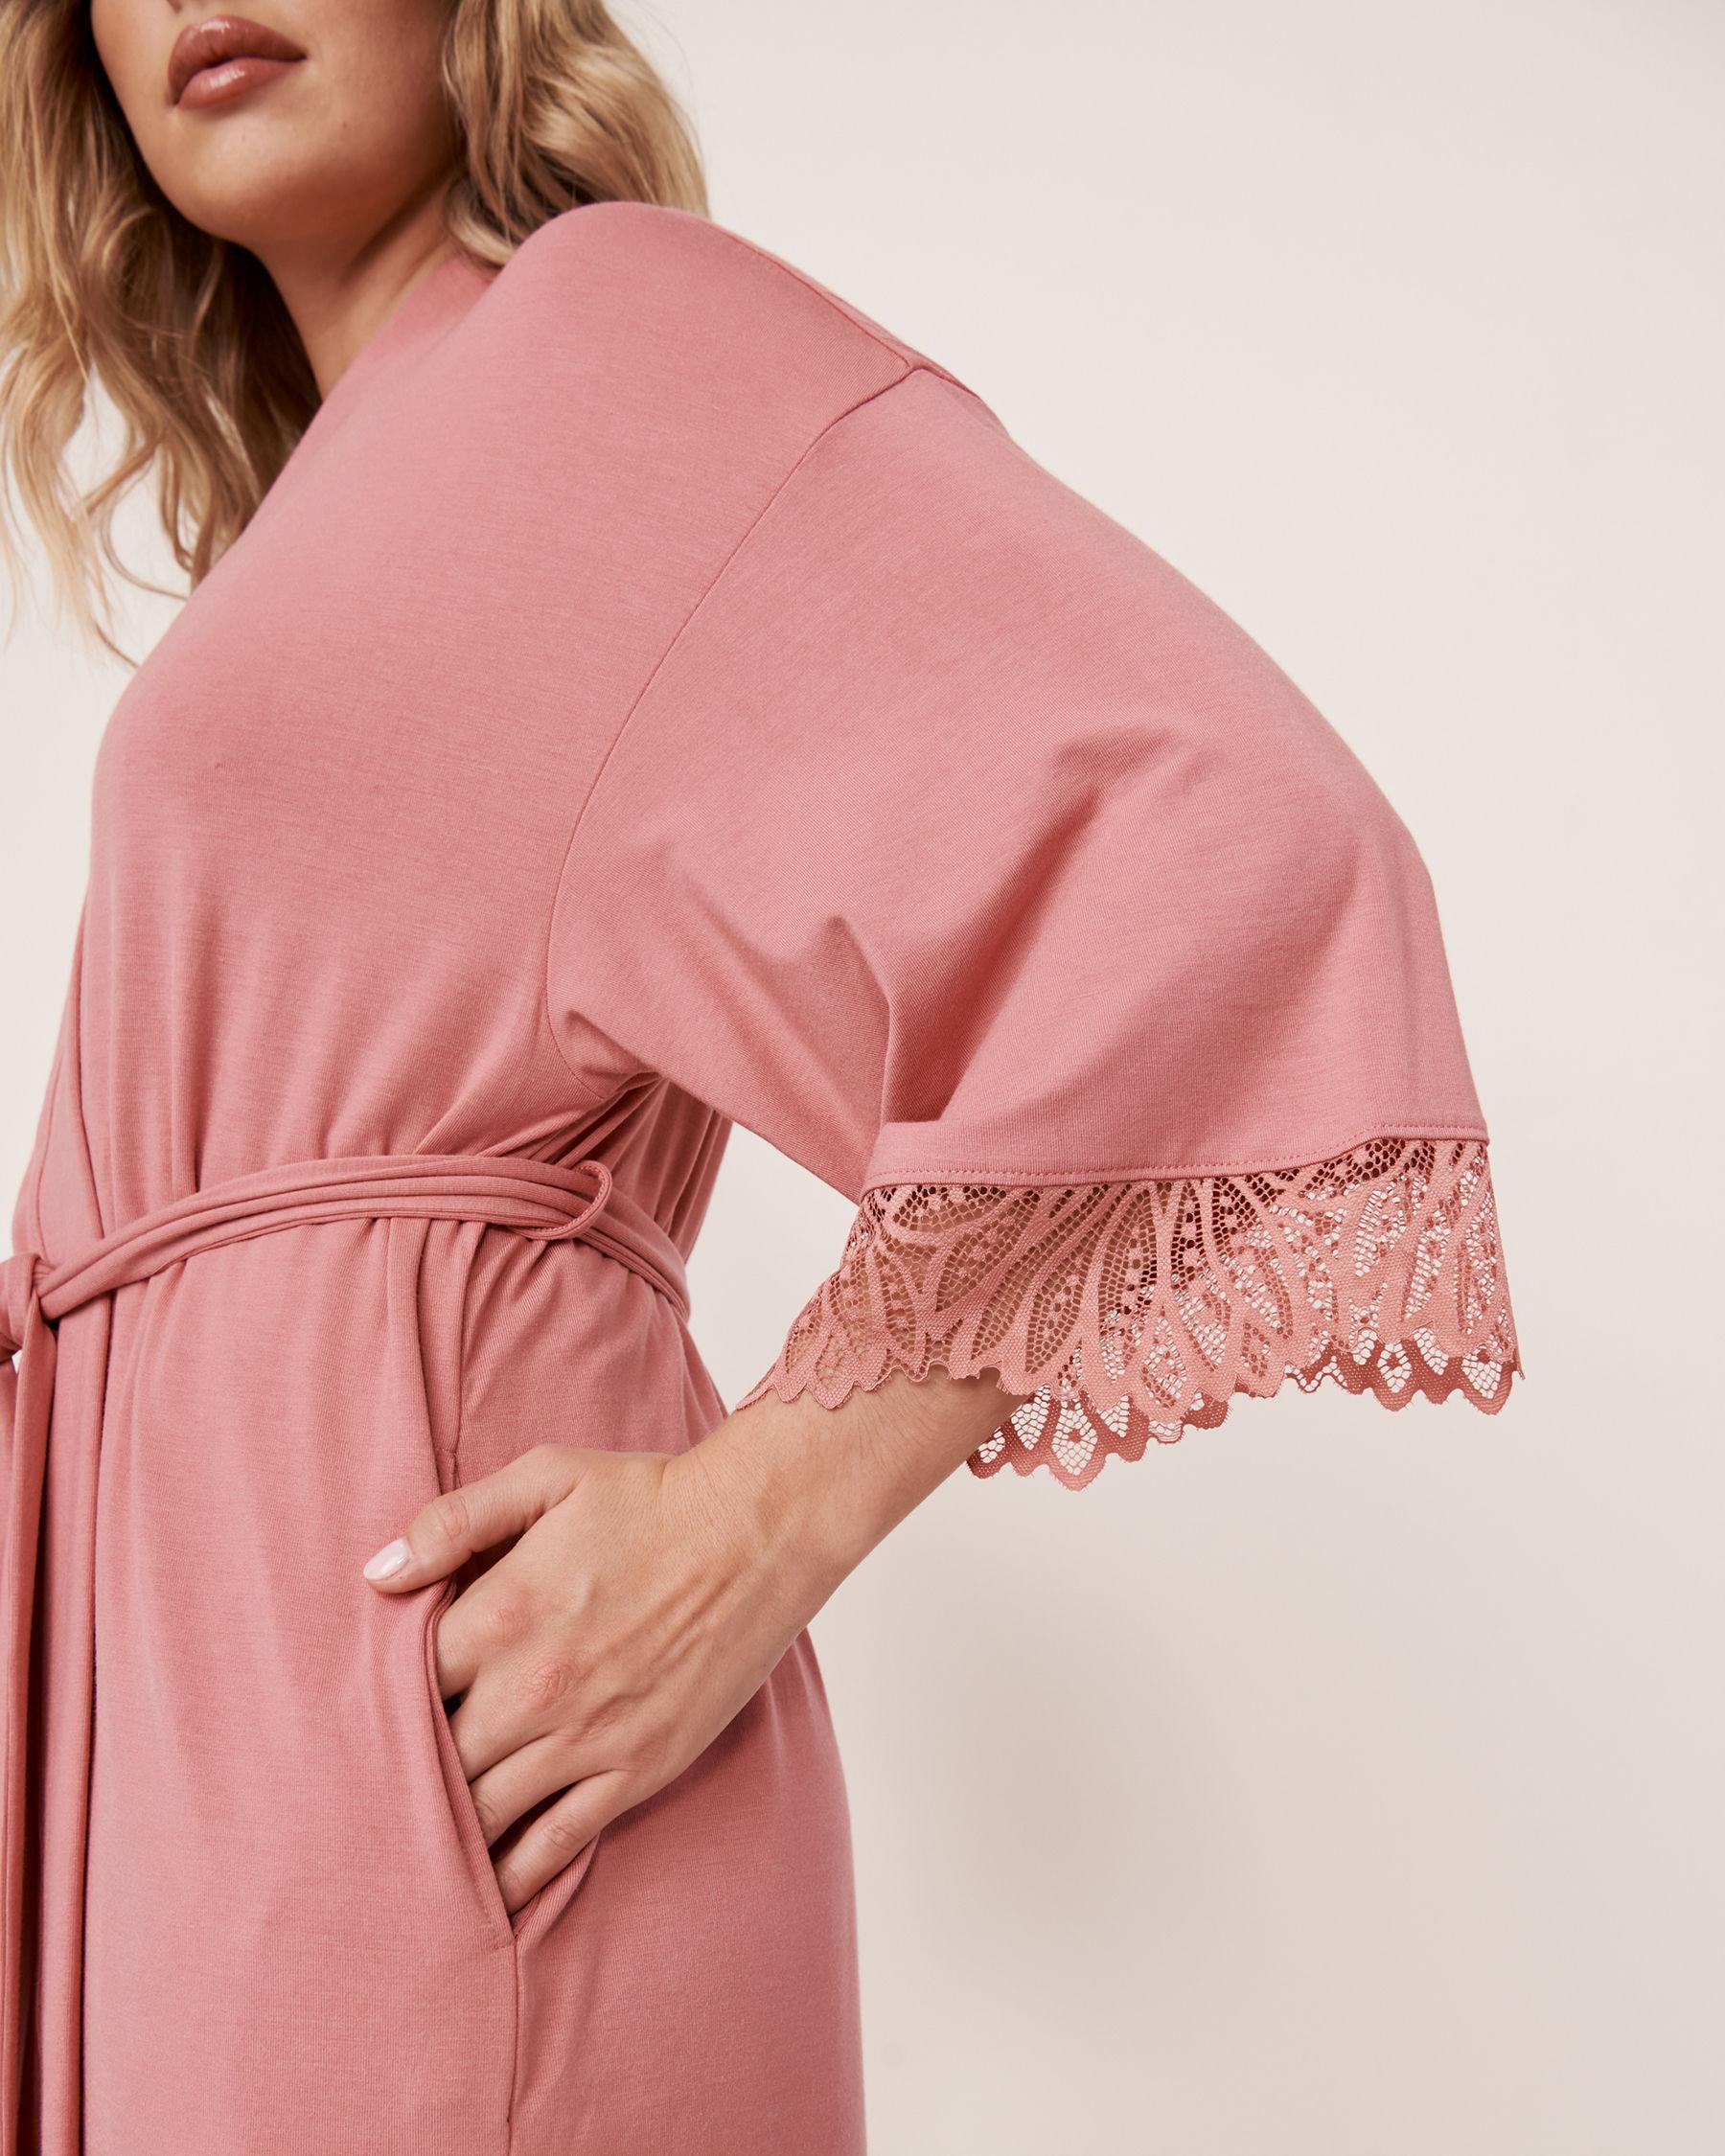 LA VIE EN ROSE Kimono garniture de dentelle en modal Vieux rose 40600020 - Voir2